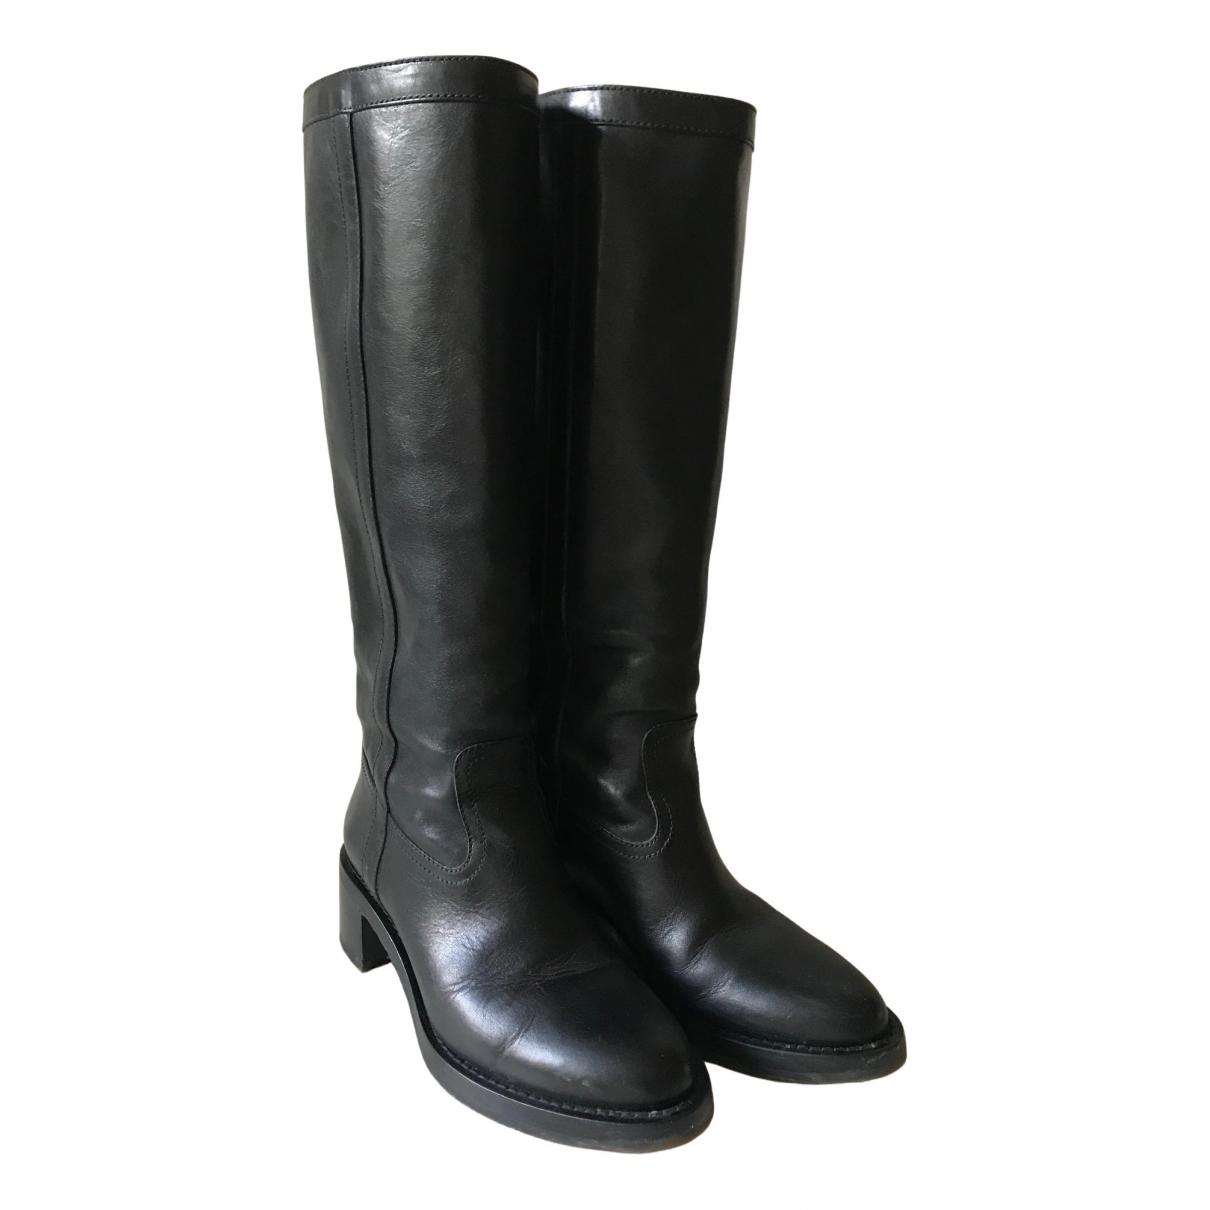 Celine Folco Black Leather Boots for Women 38 EU